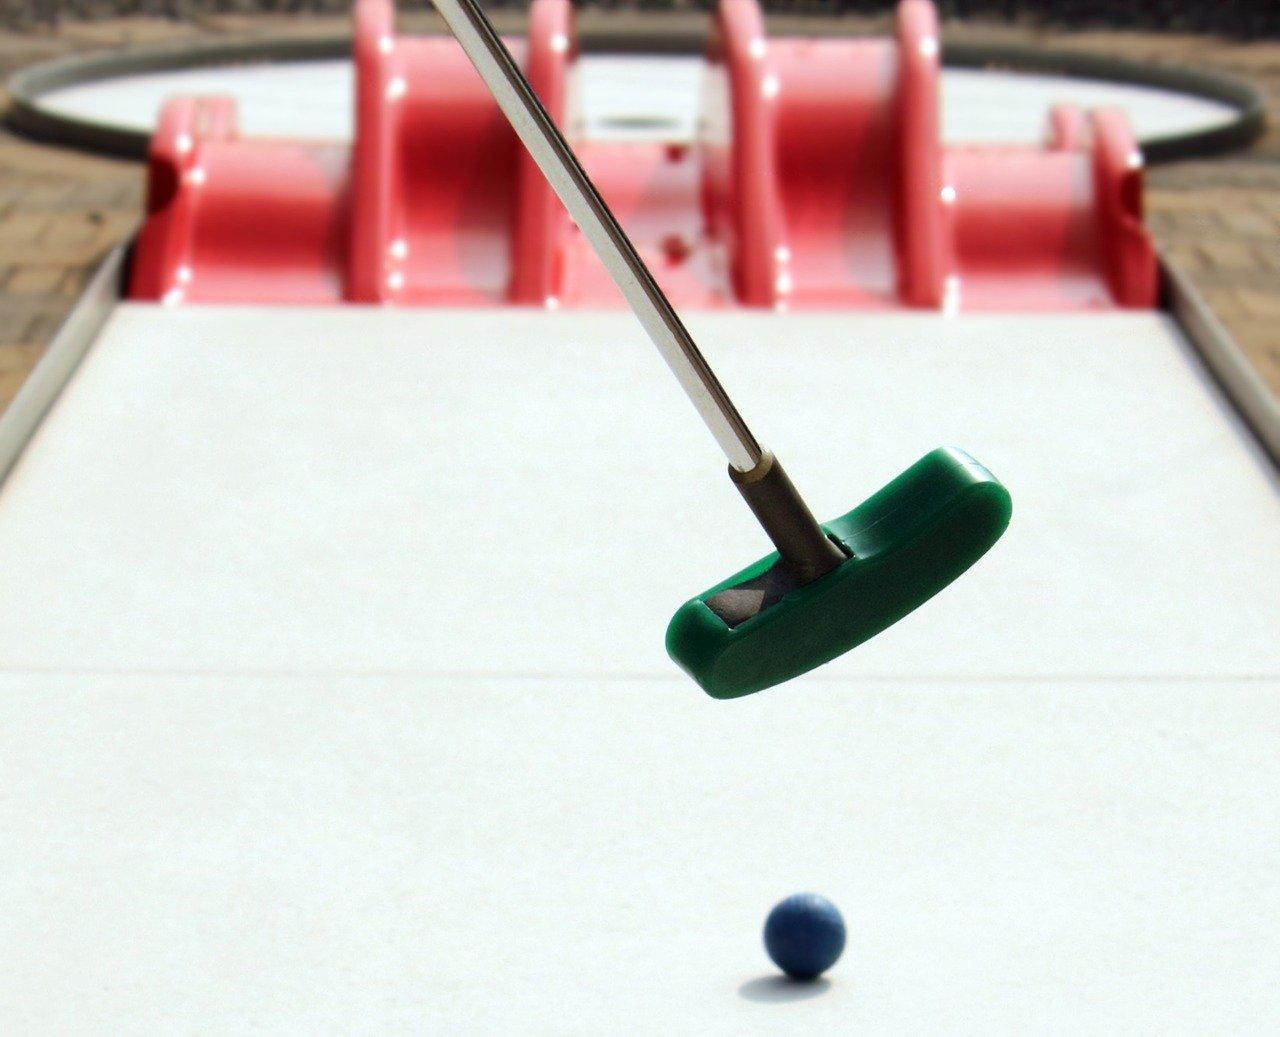 miniature-golf-2254571_1280